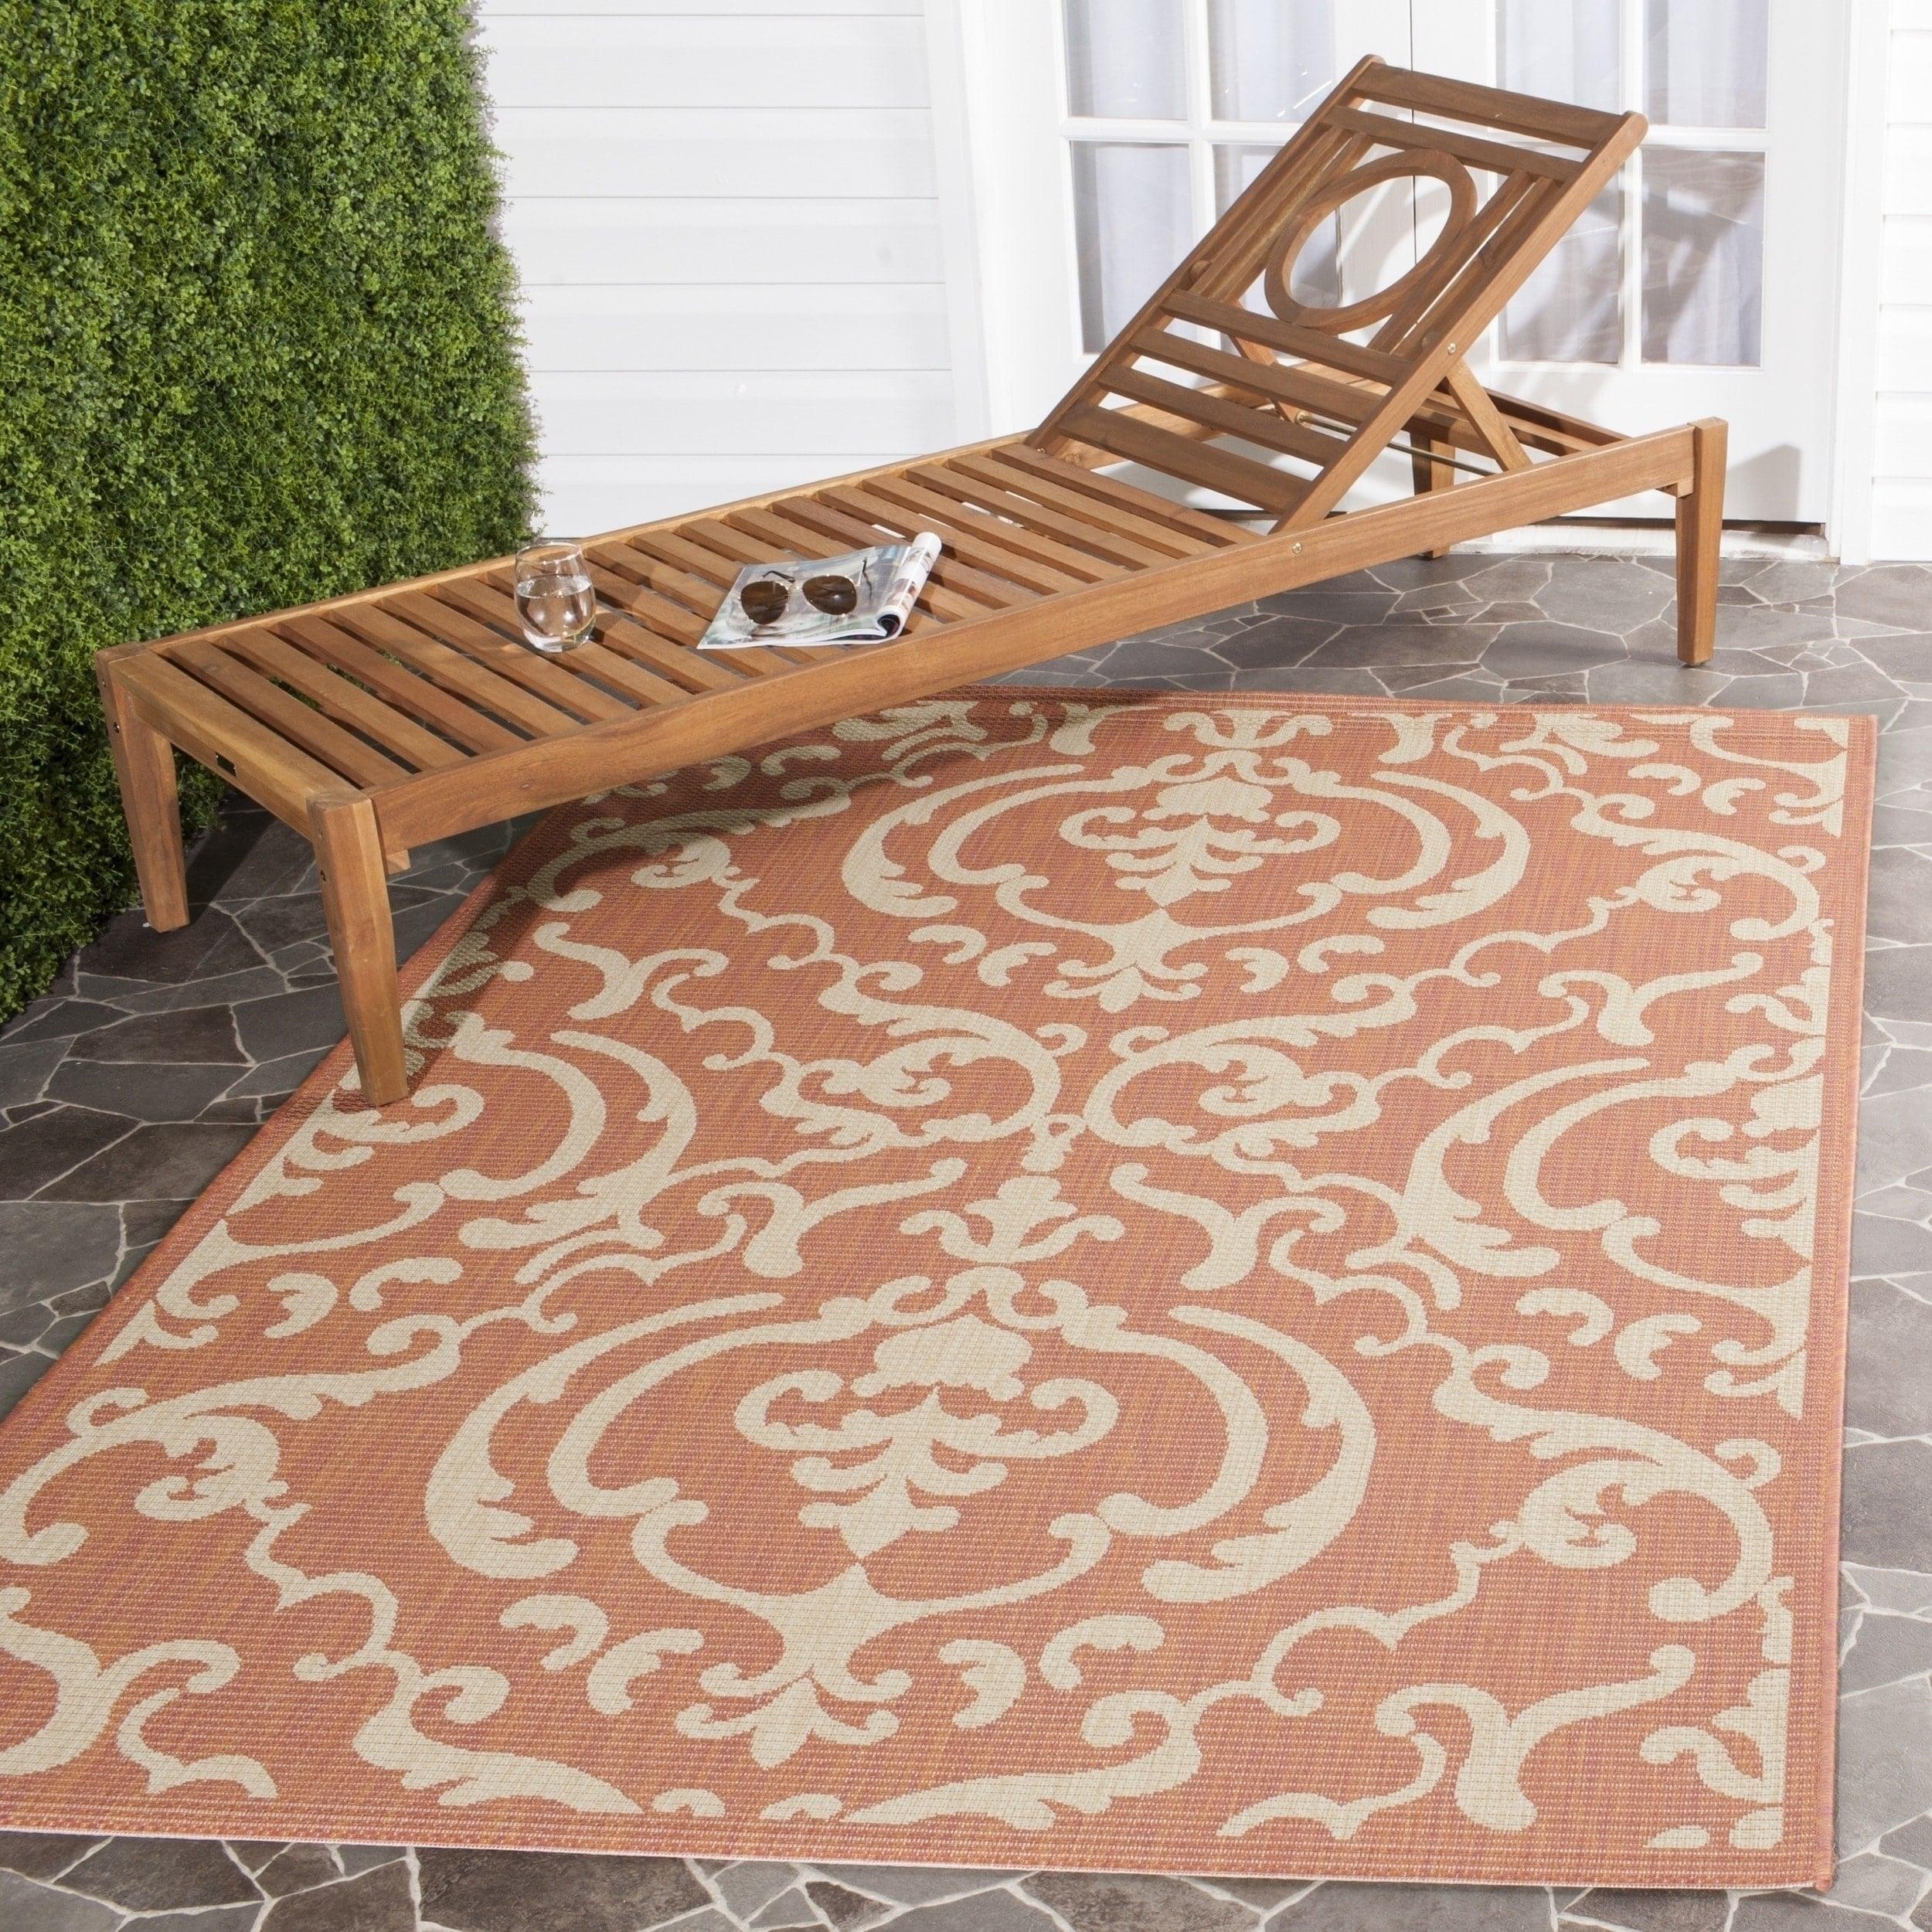 Safavieh Bimini Damask Terracotta Natural Indoor Outdoor Rug 7 10 X 11